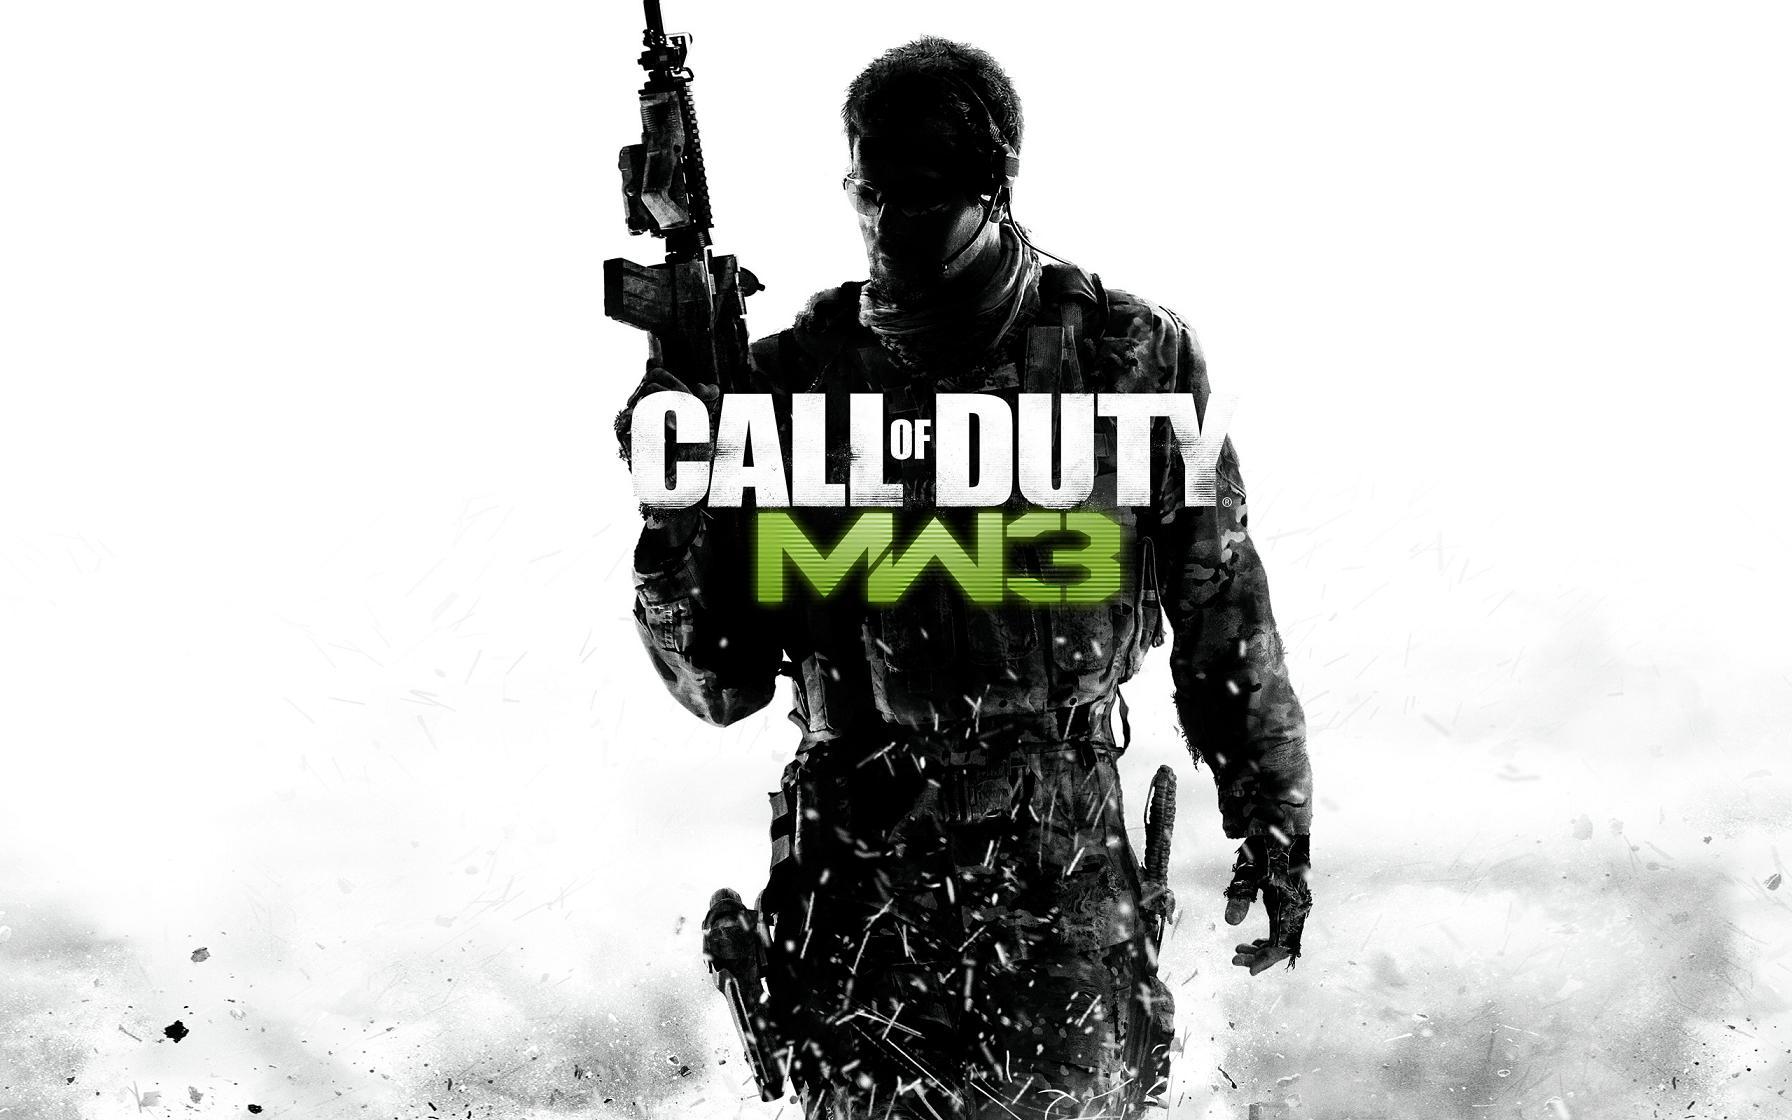 Wallpapers Desktops   Call Of Duty 1792x1120